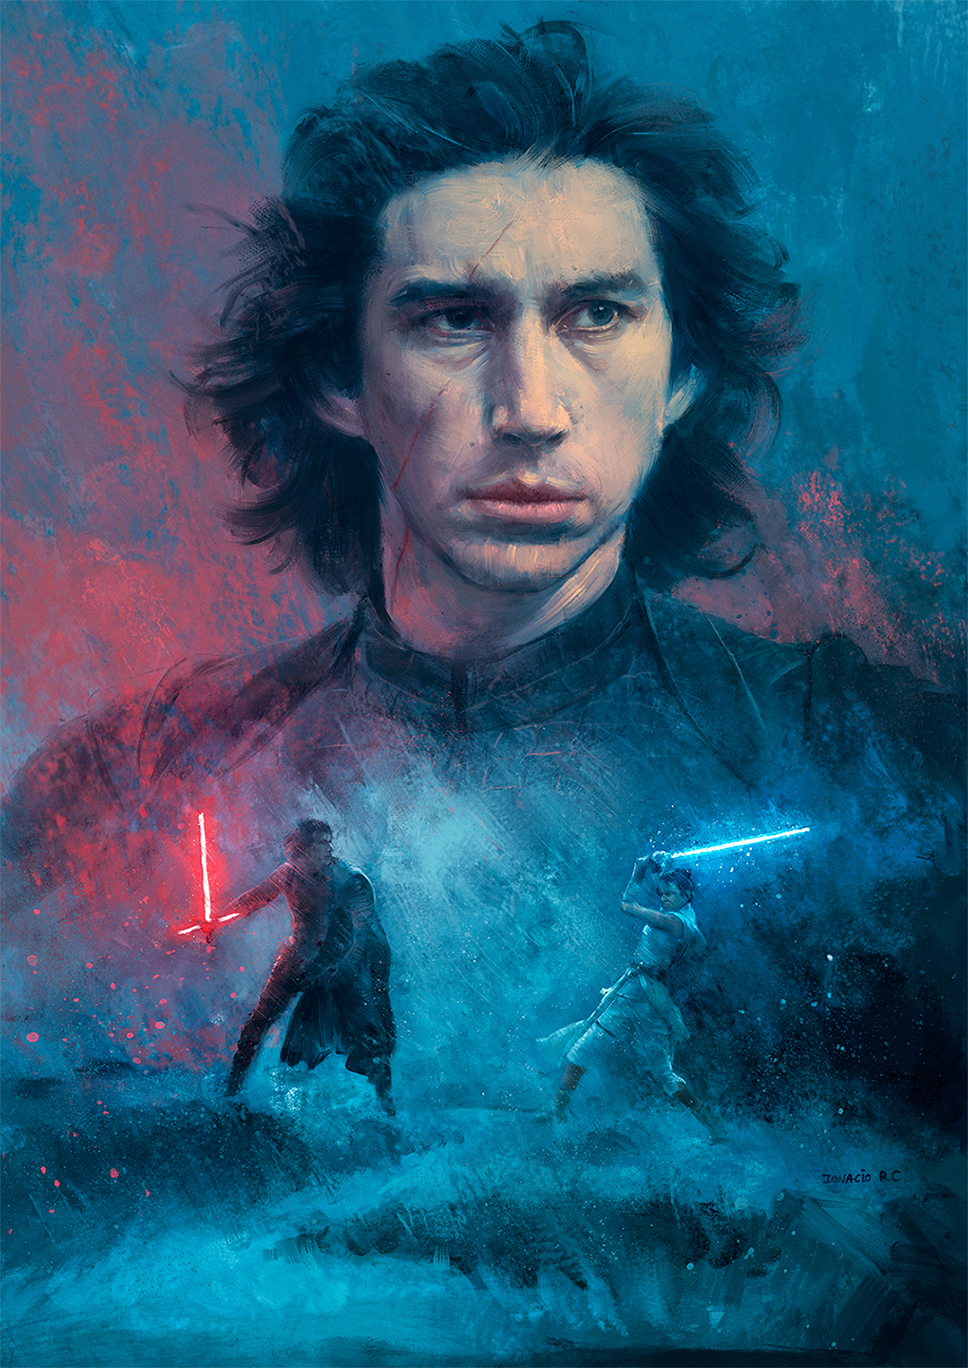 Star Wars Kylo Ren Ben Solo Starwars Kyloren Starwarsaesthetic Star Wars Art Star Wars Drawings Star Wars Fan Art